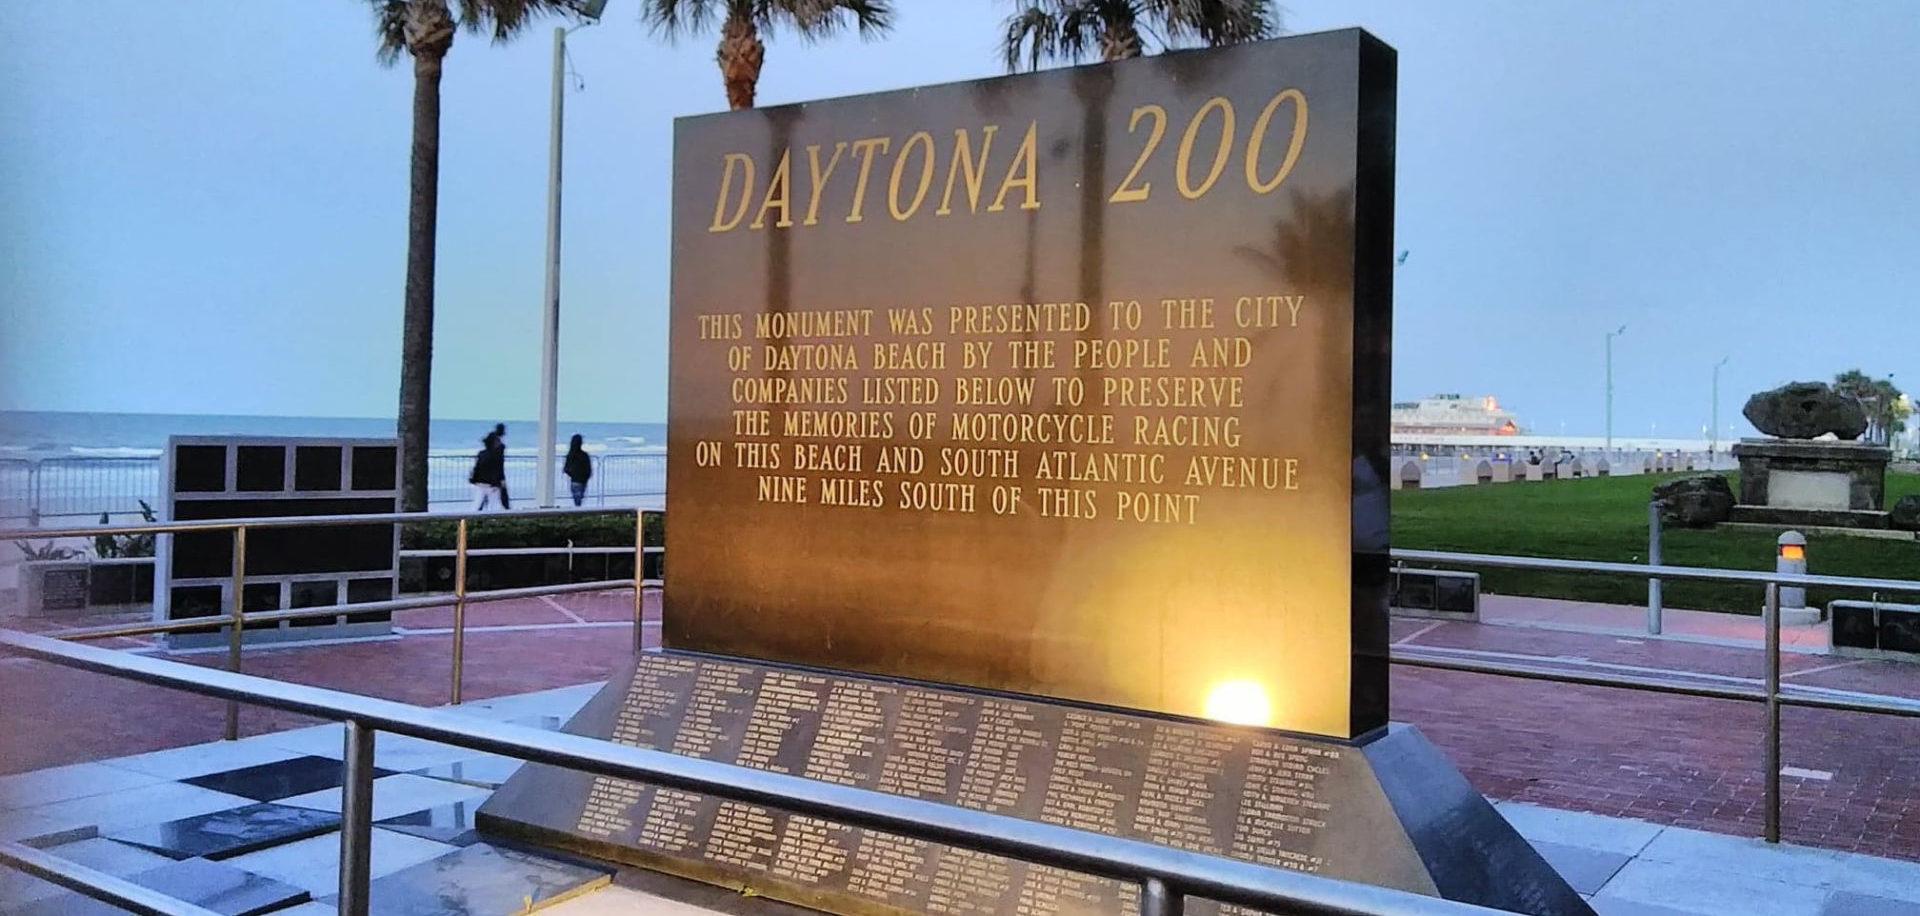 The Daytona 200 Monument. Photo by Amy Jacques, courtesy AHRMA.